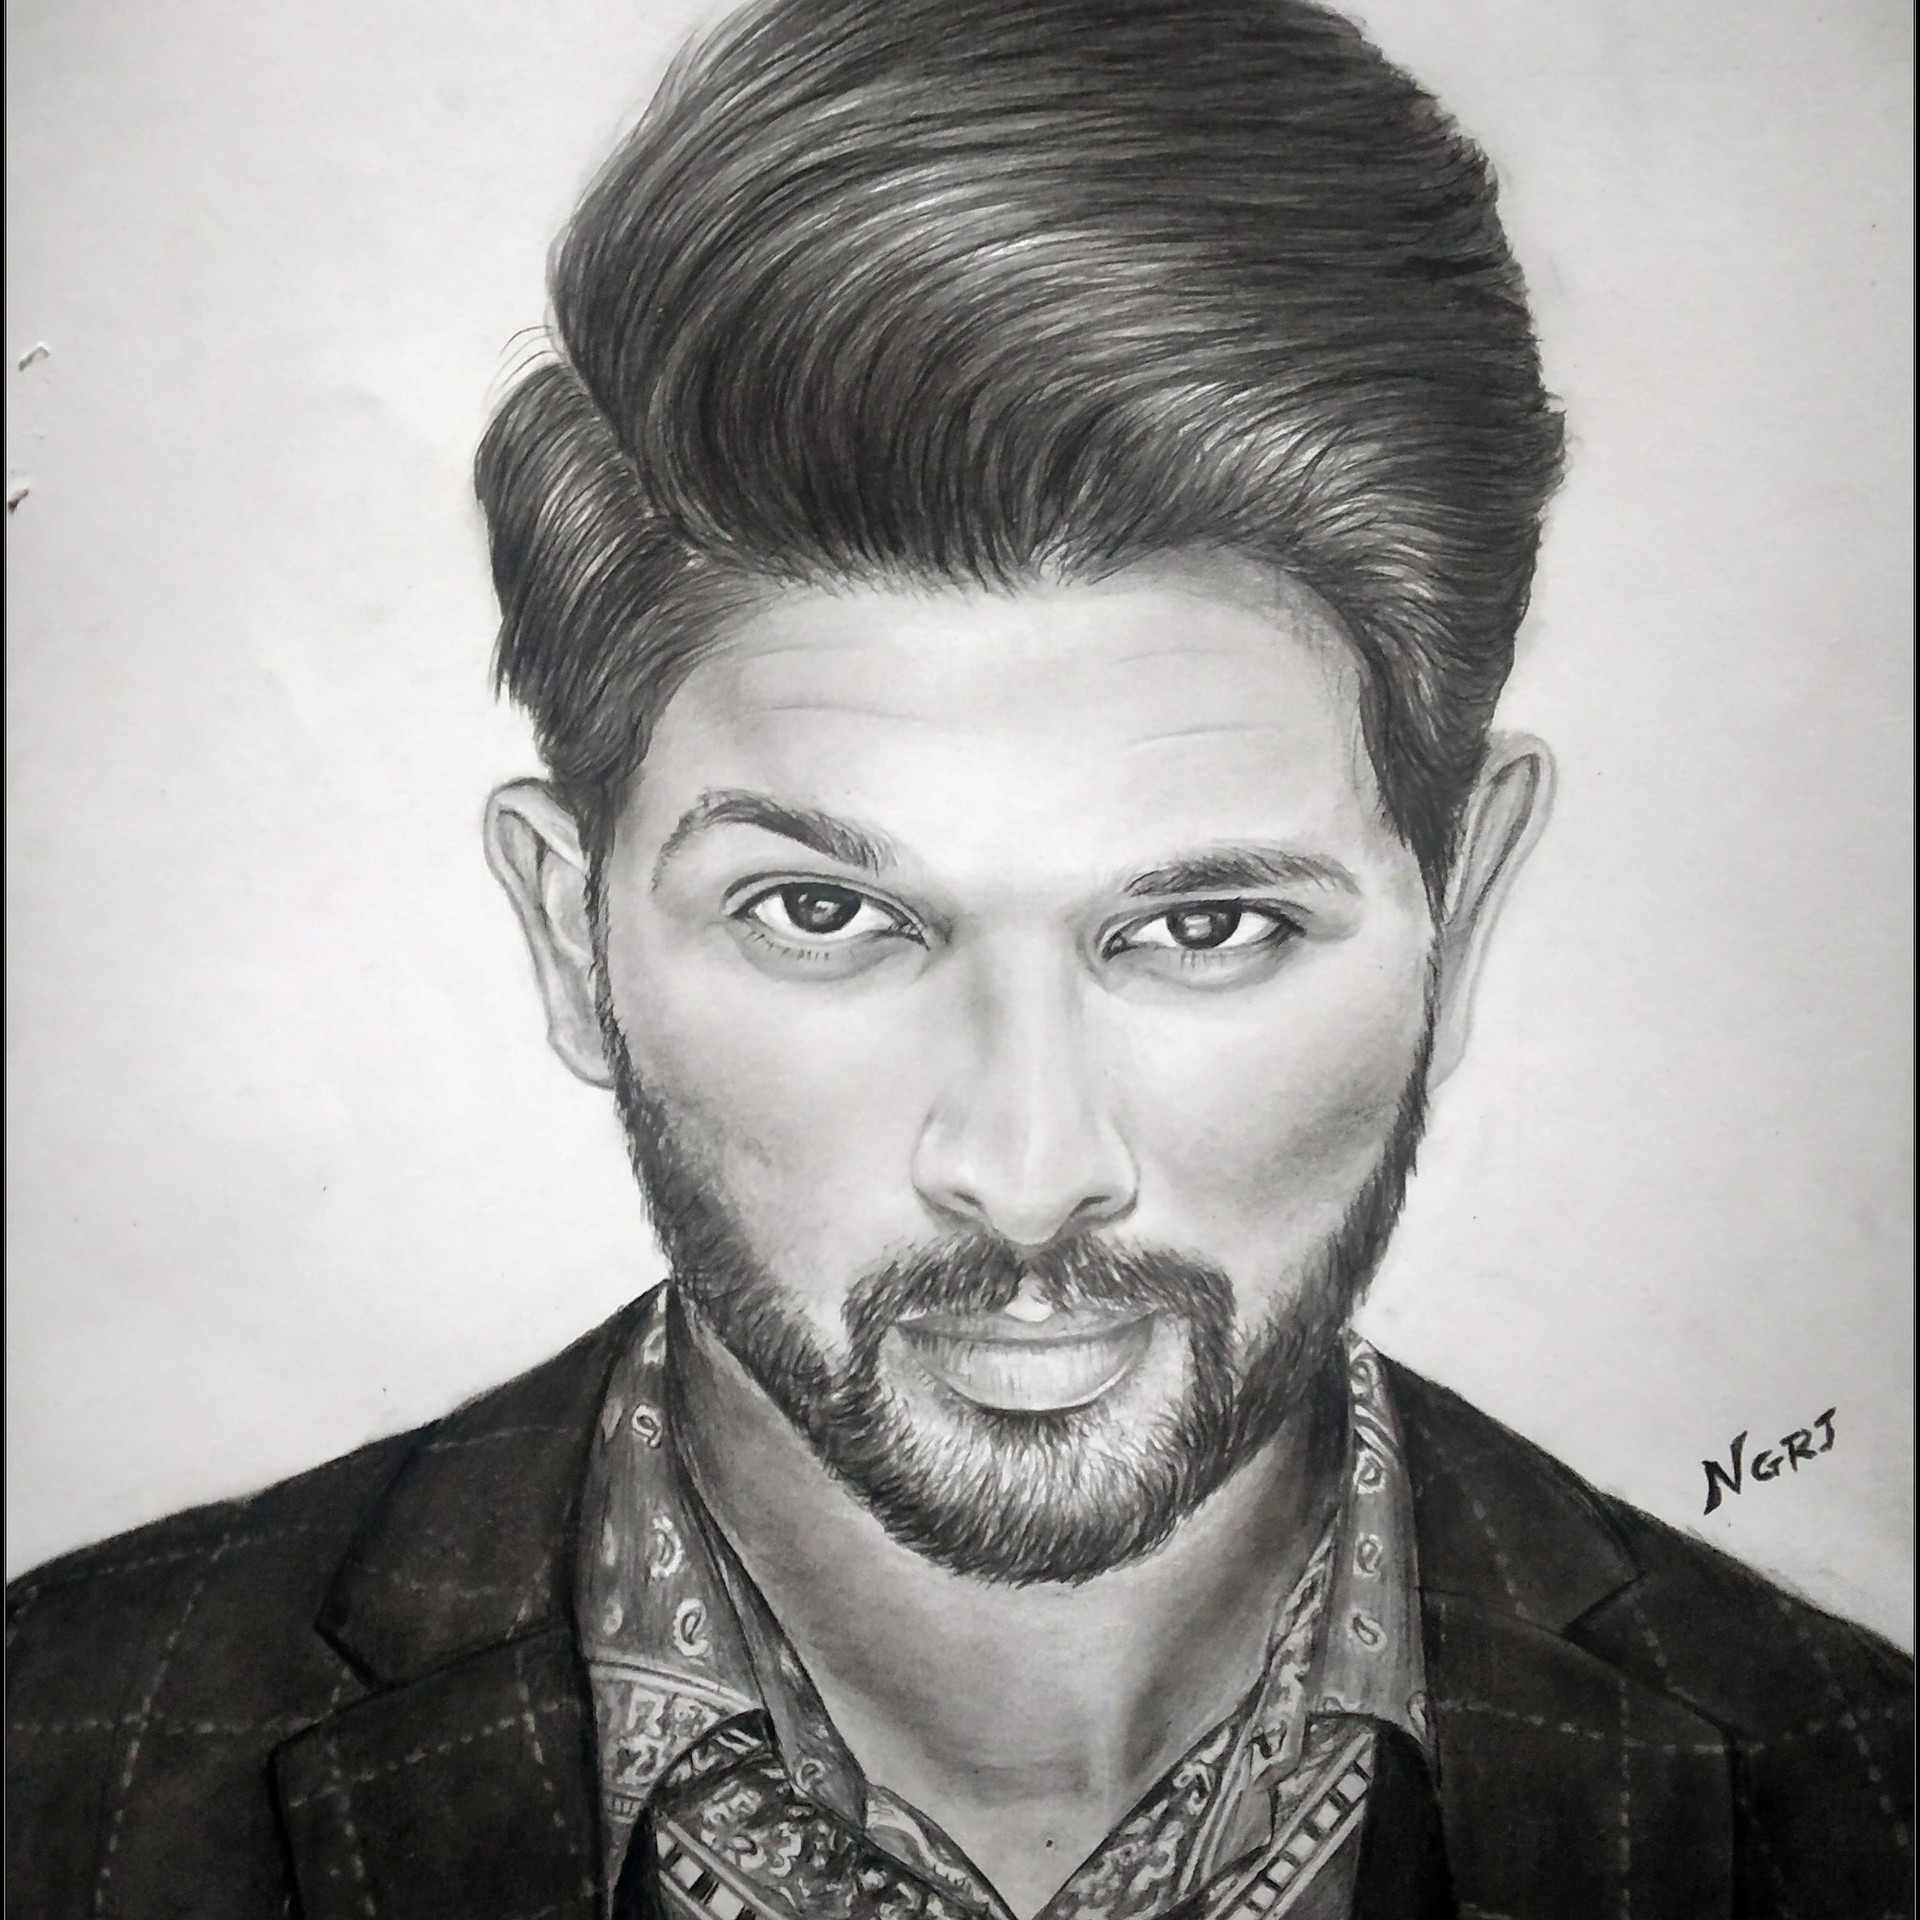 Nagaraj acharya charcoal pencil sketch